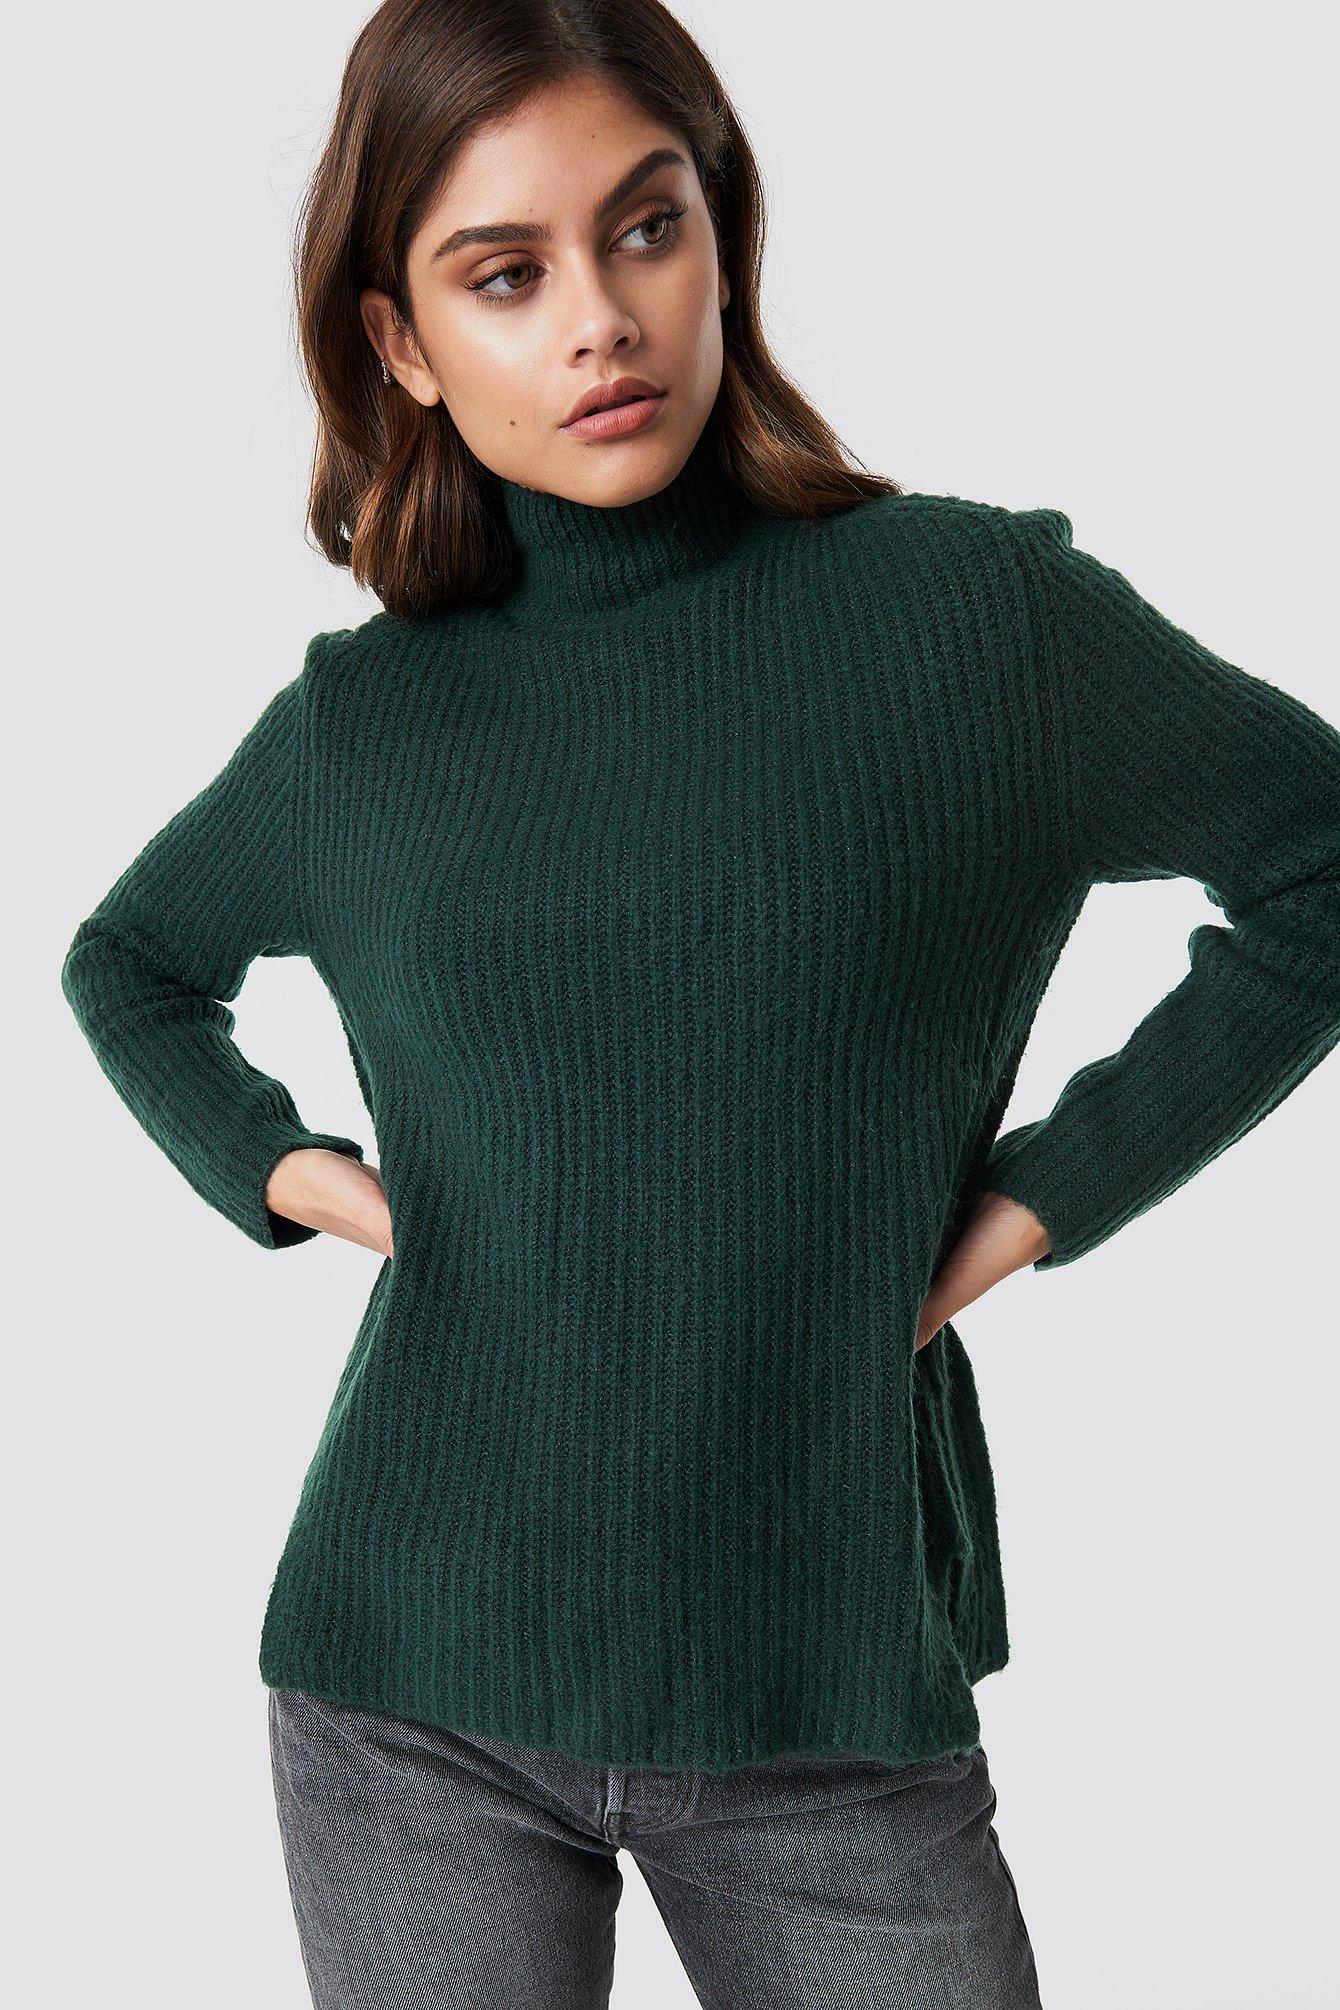 rut&circle -  Marielle knit - Green